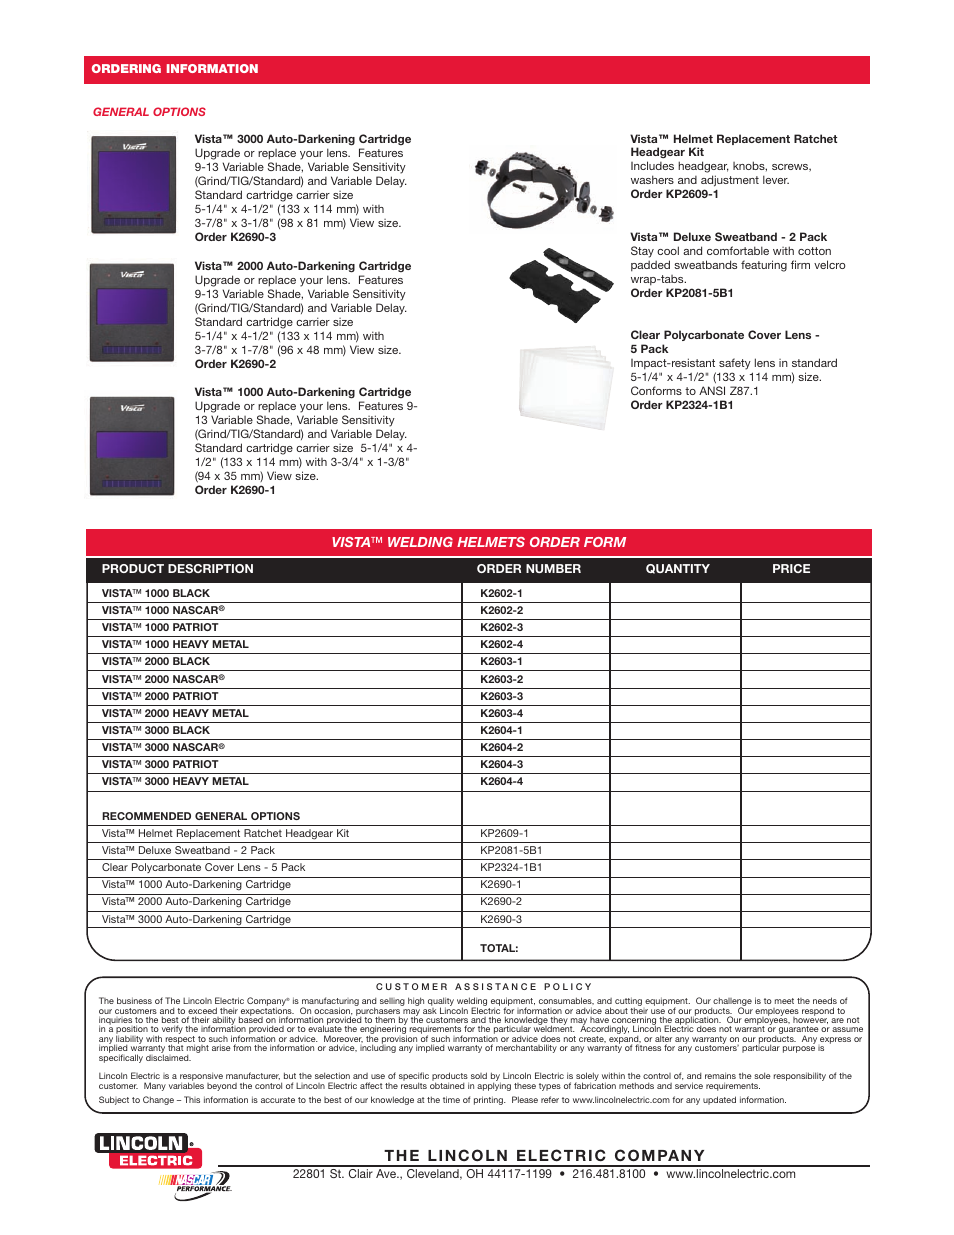 Vista ™ welding helmets order form | Lincoln Electric Welding Helmet User  Manual | Page 4